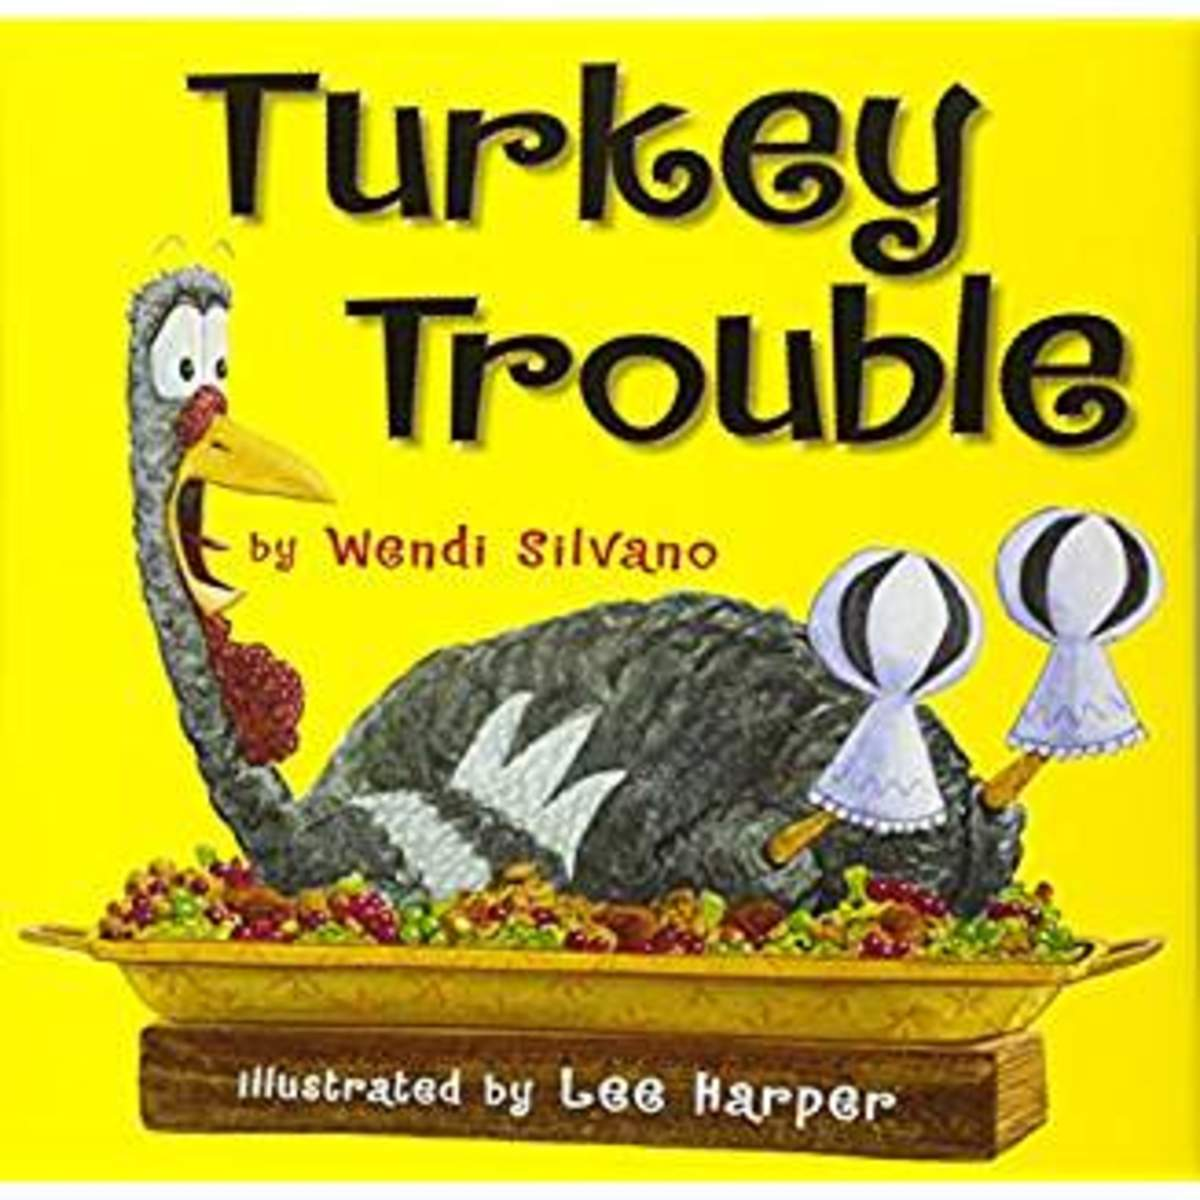 Turkey Trouble by Wendy Silvano